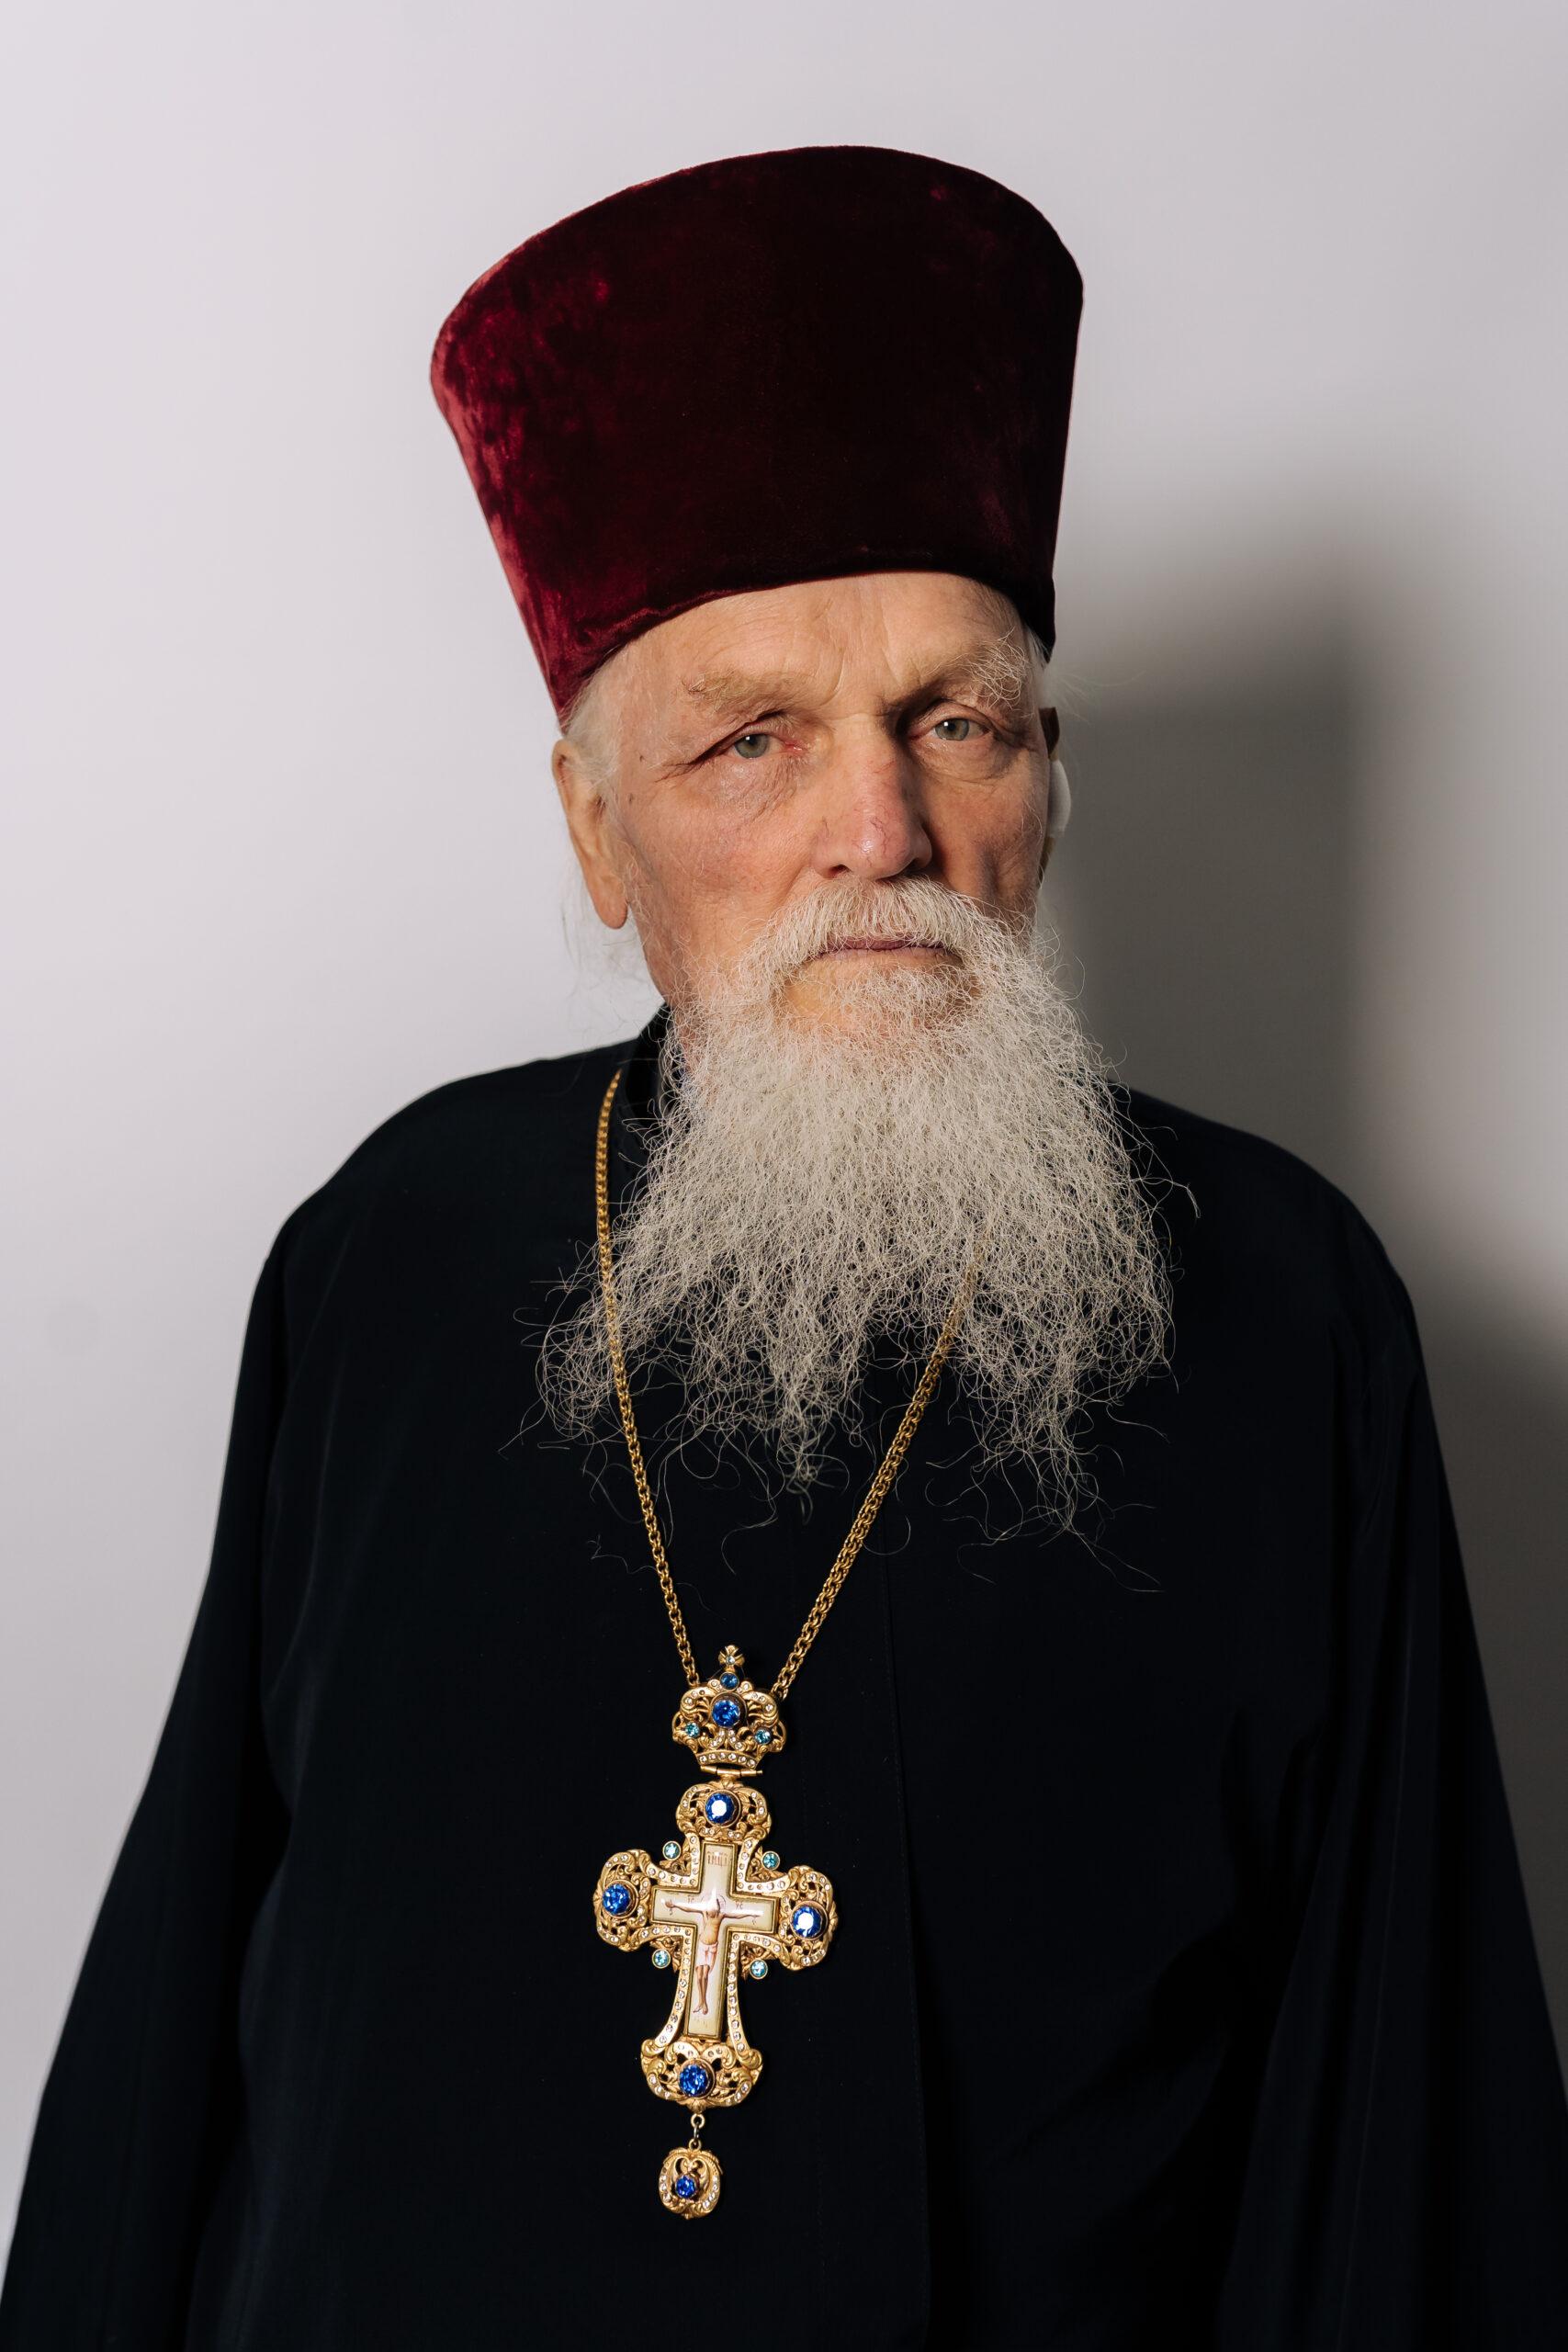 протоиерей Борис Синягин